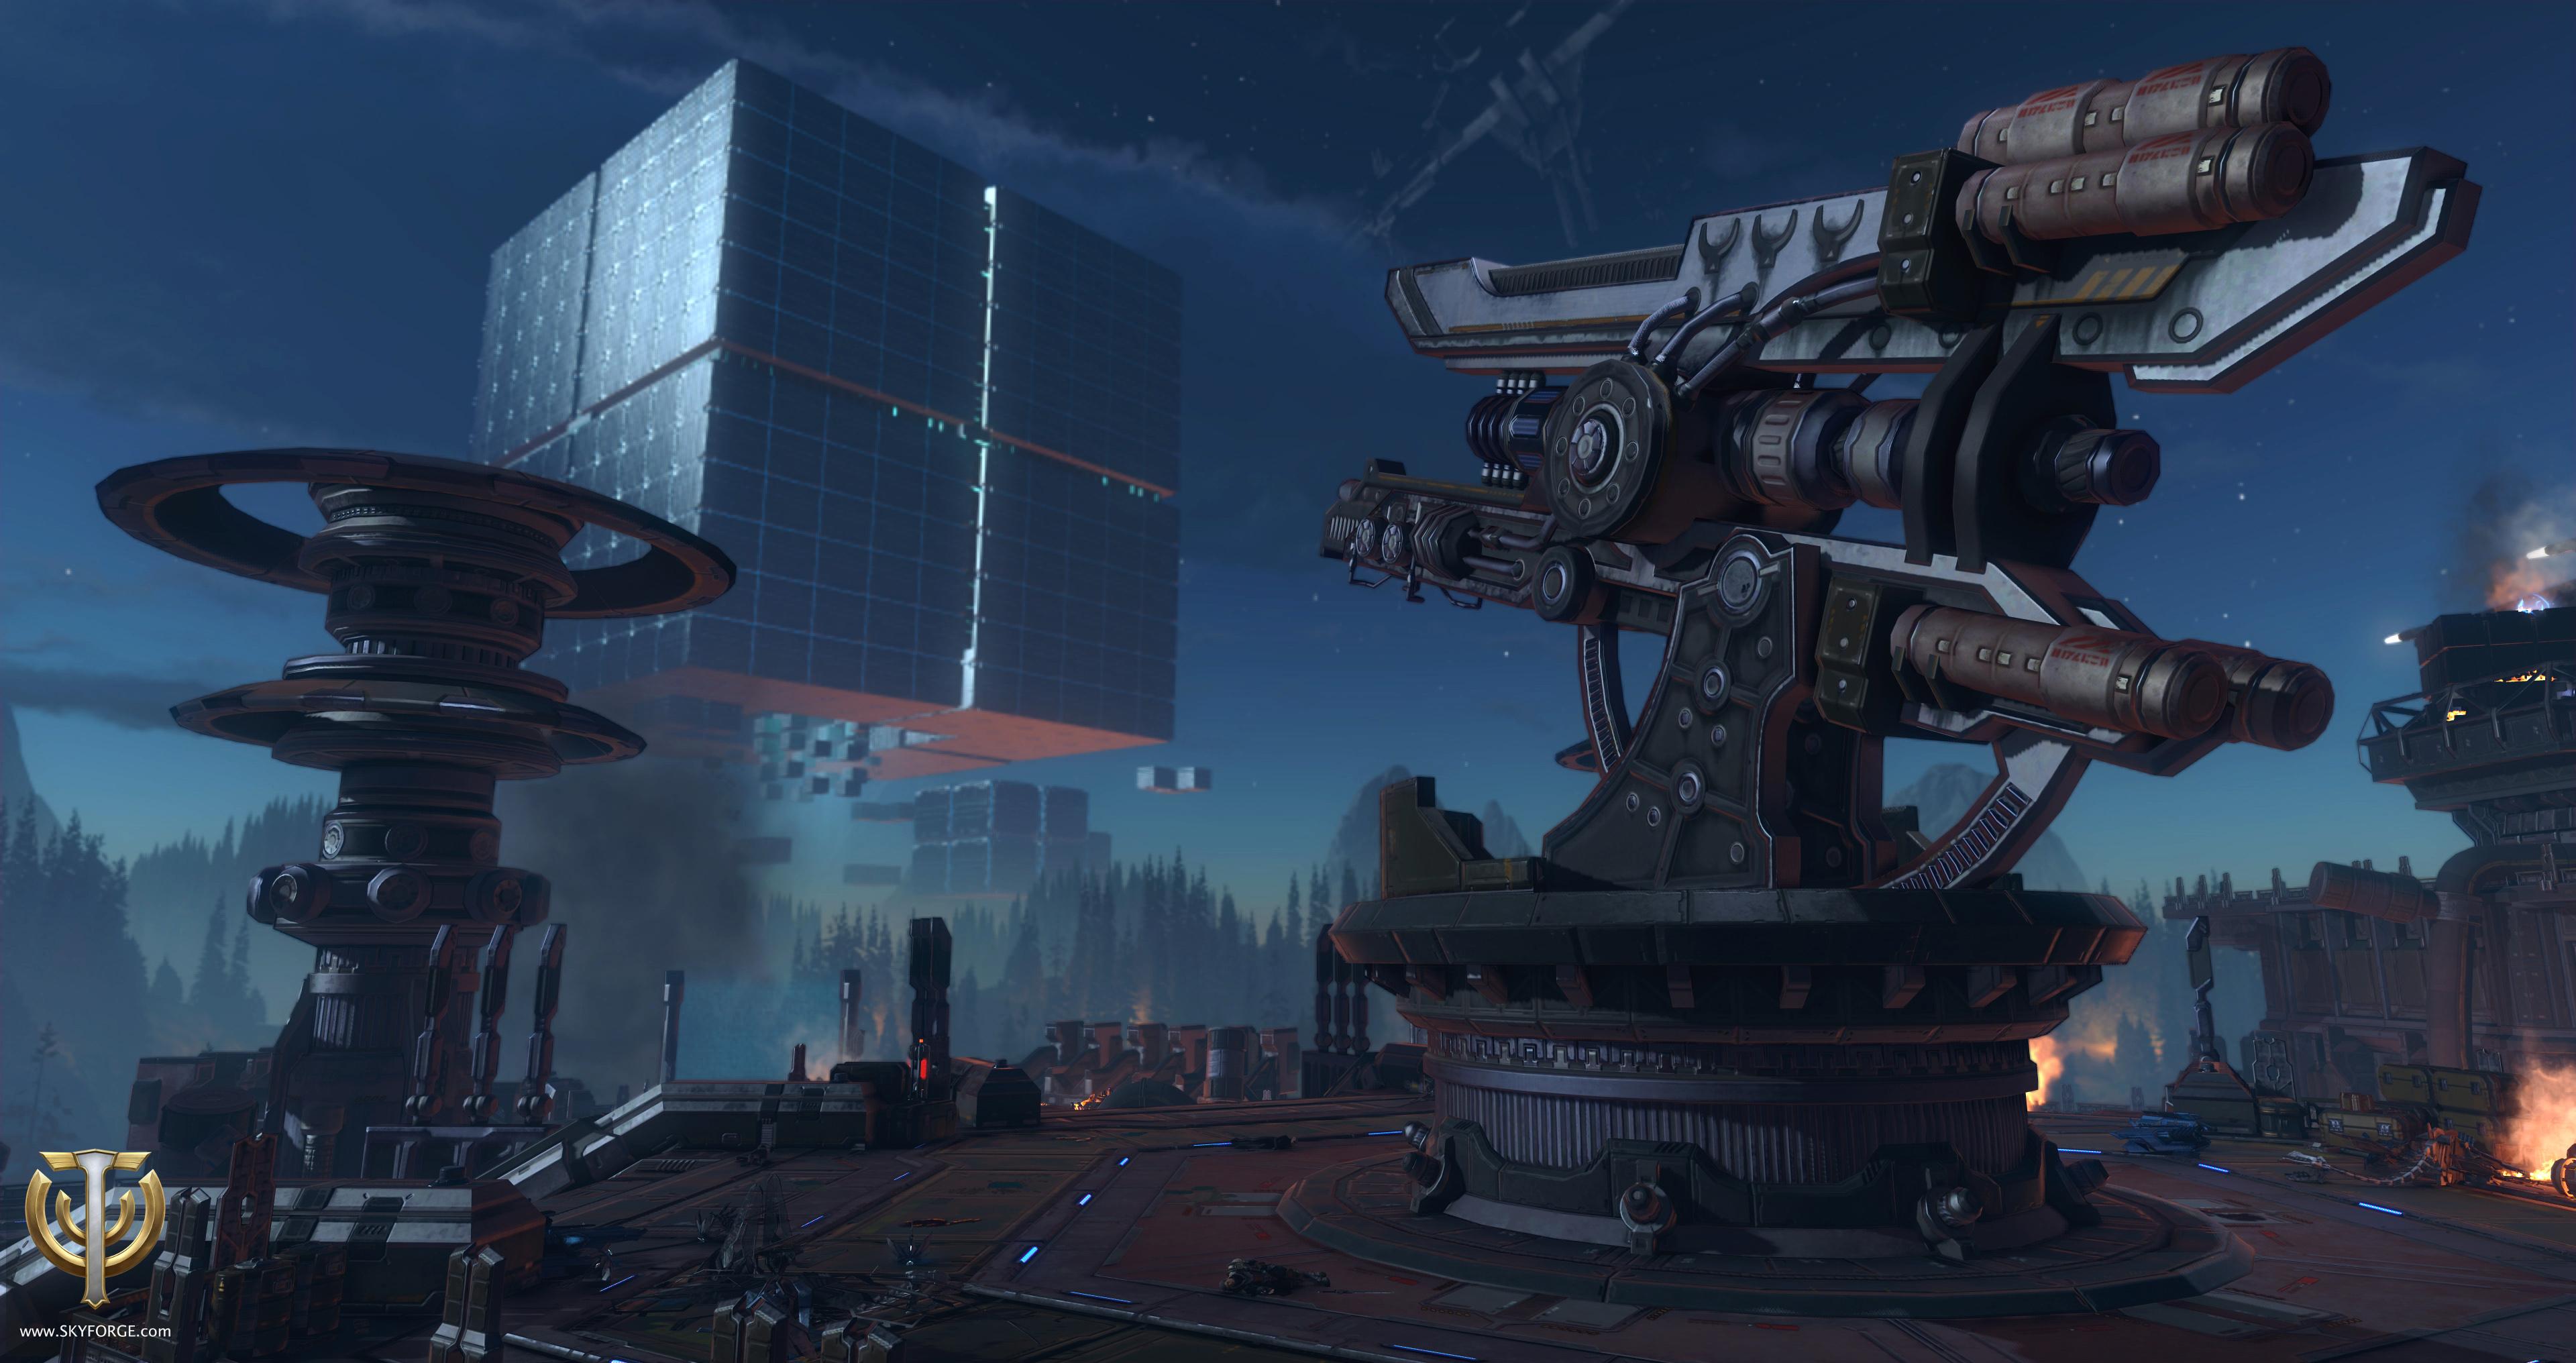 Skyforge invasion - X35 Earthwalker